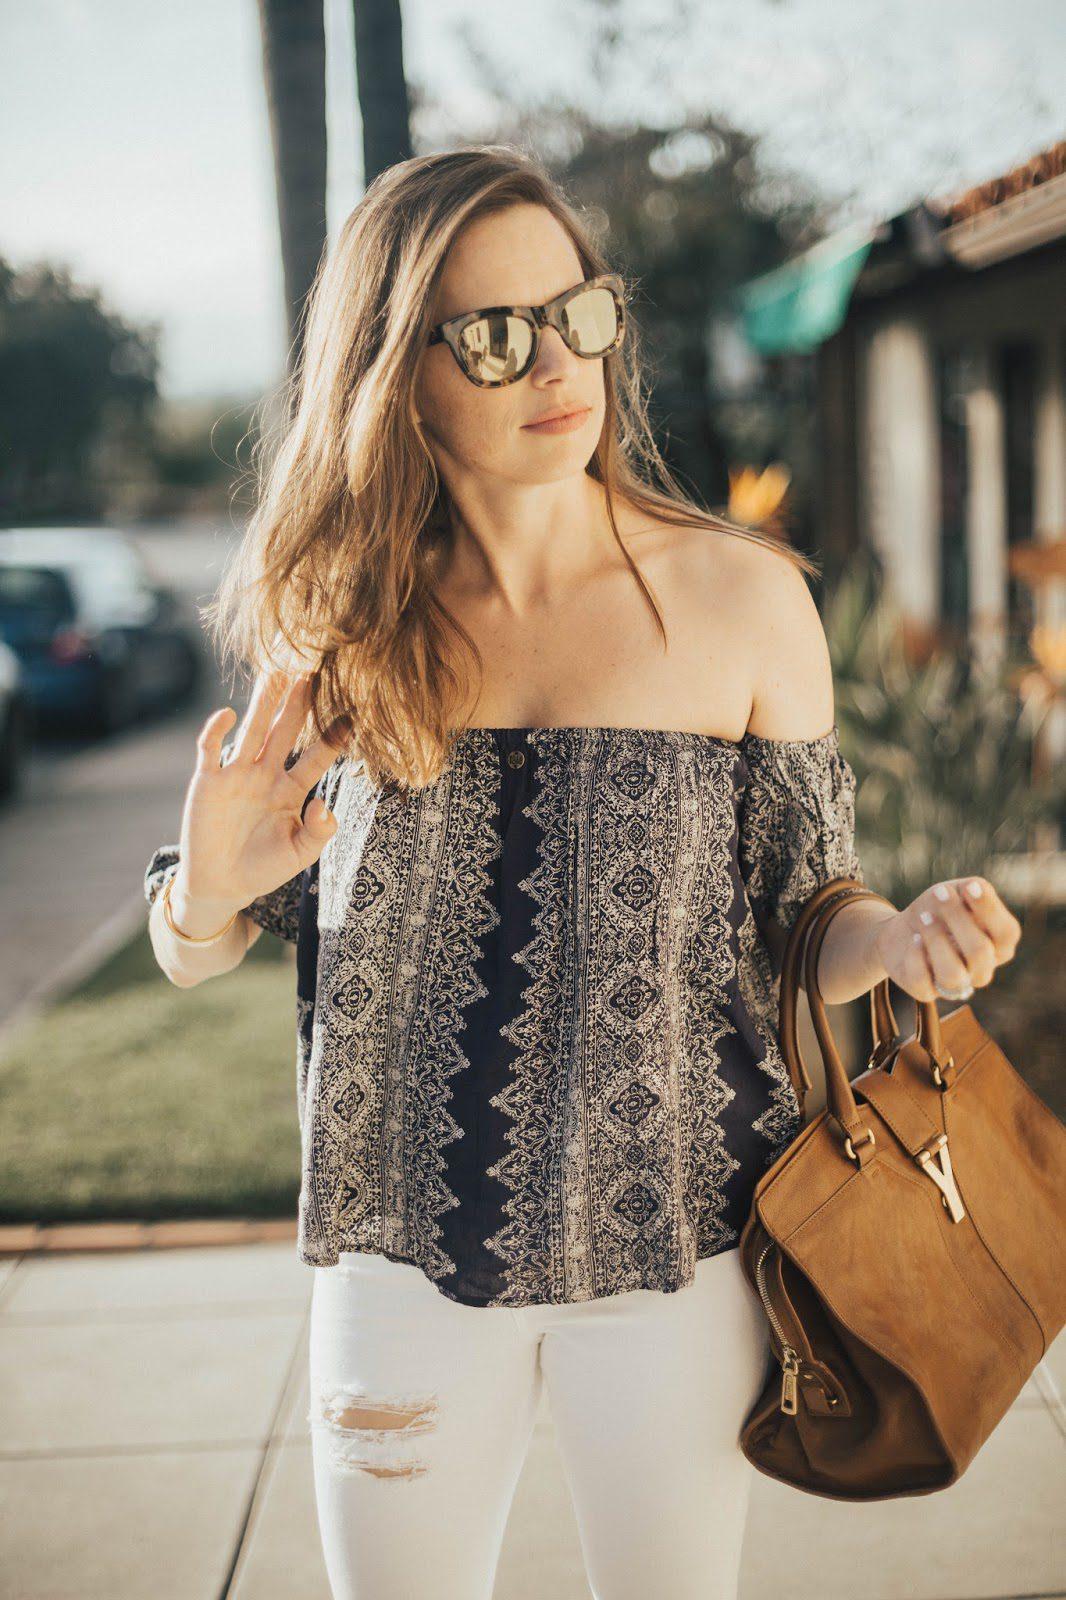 coachella outfit